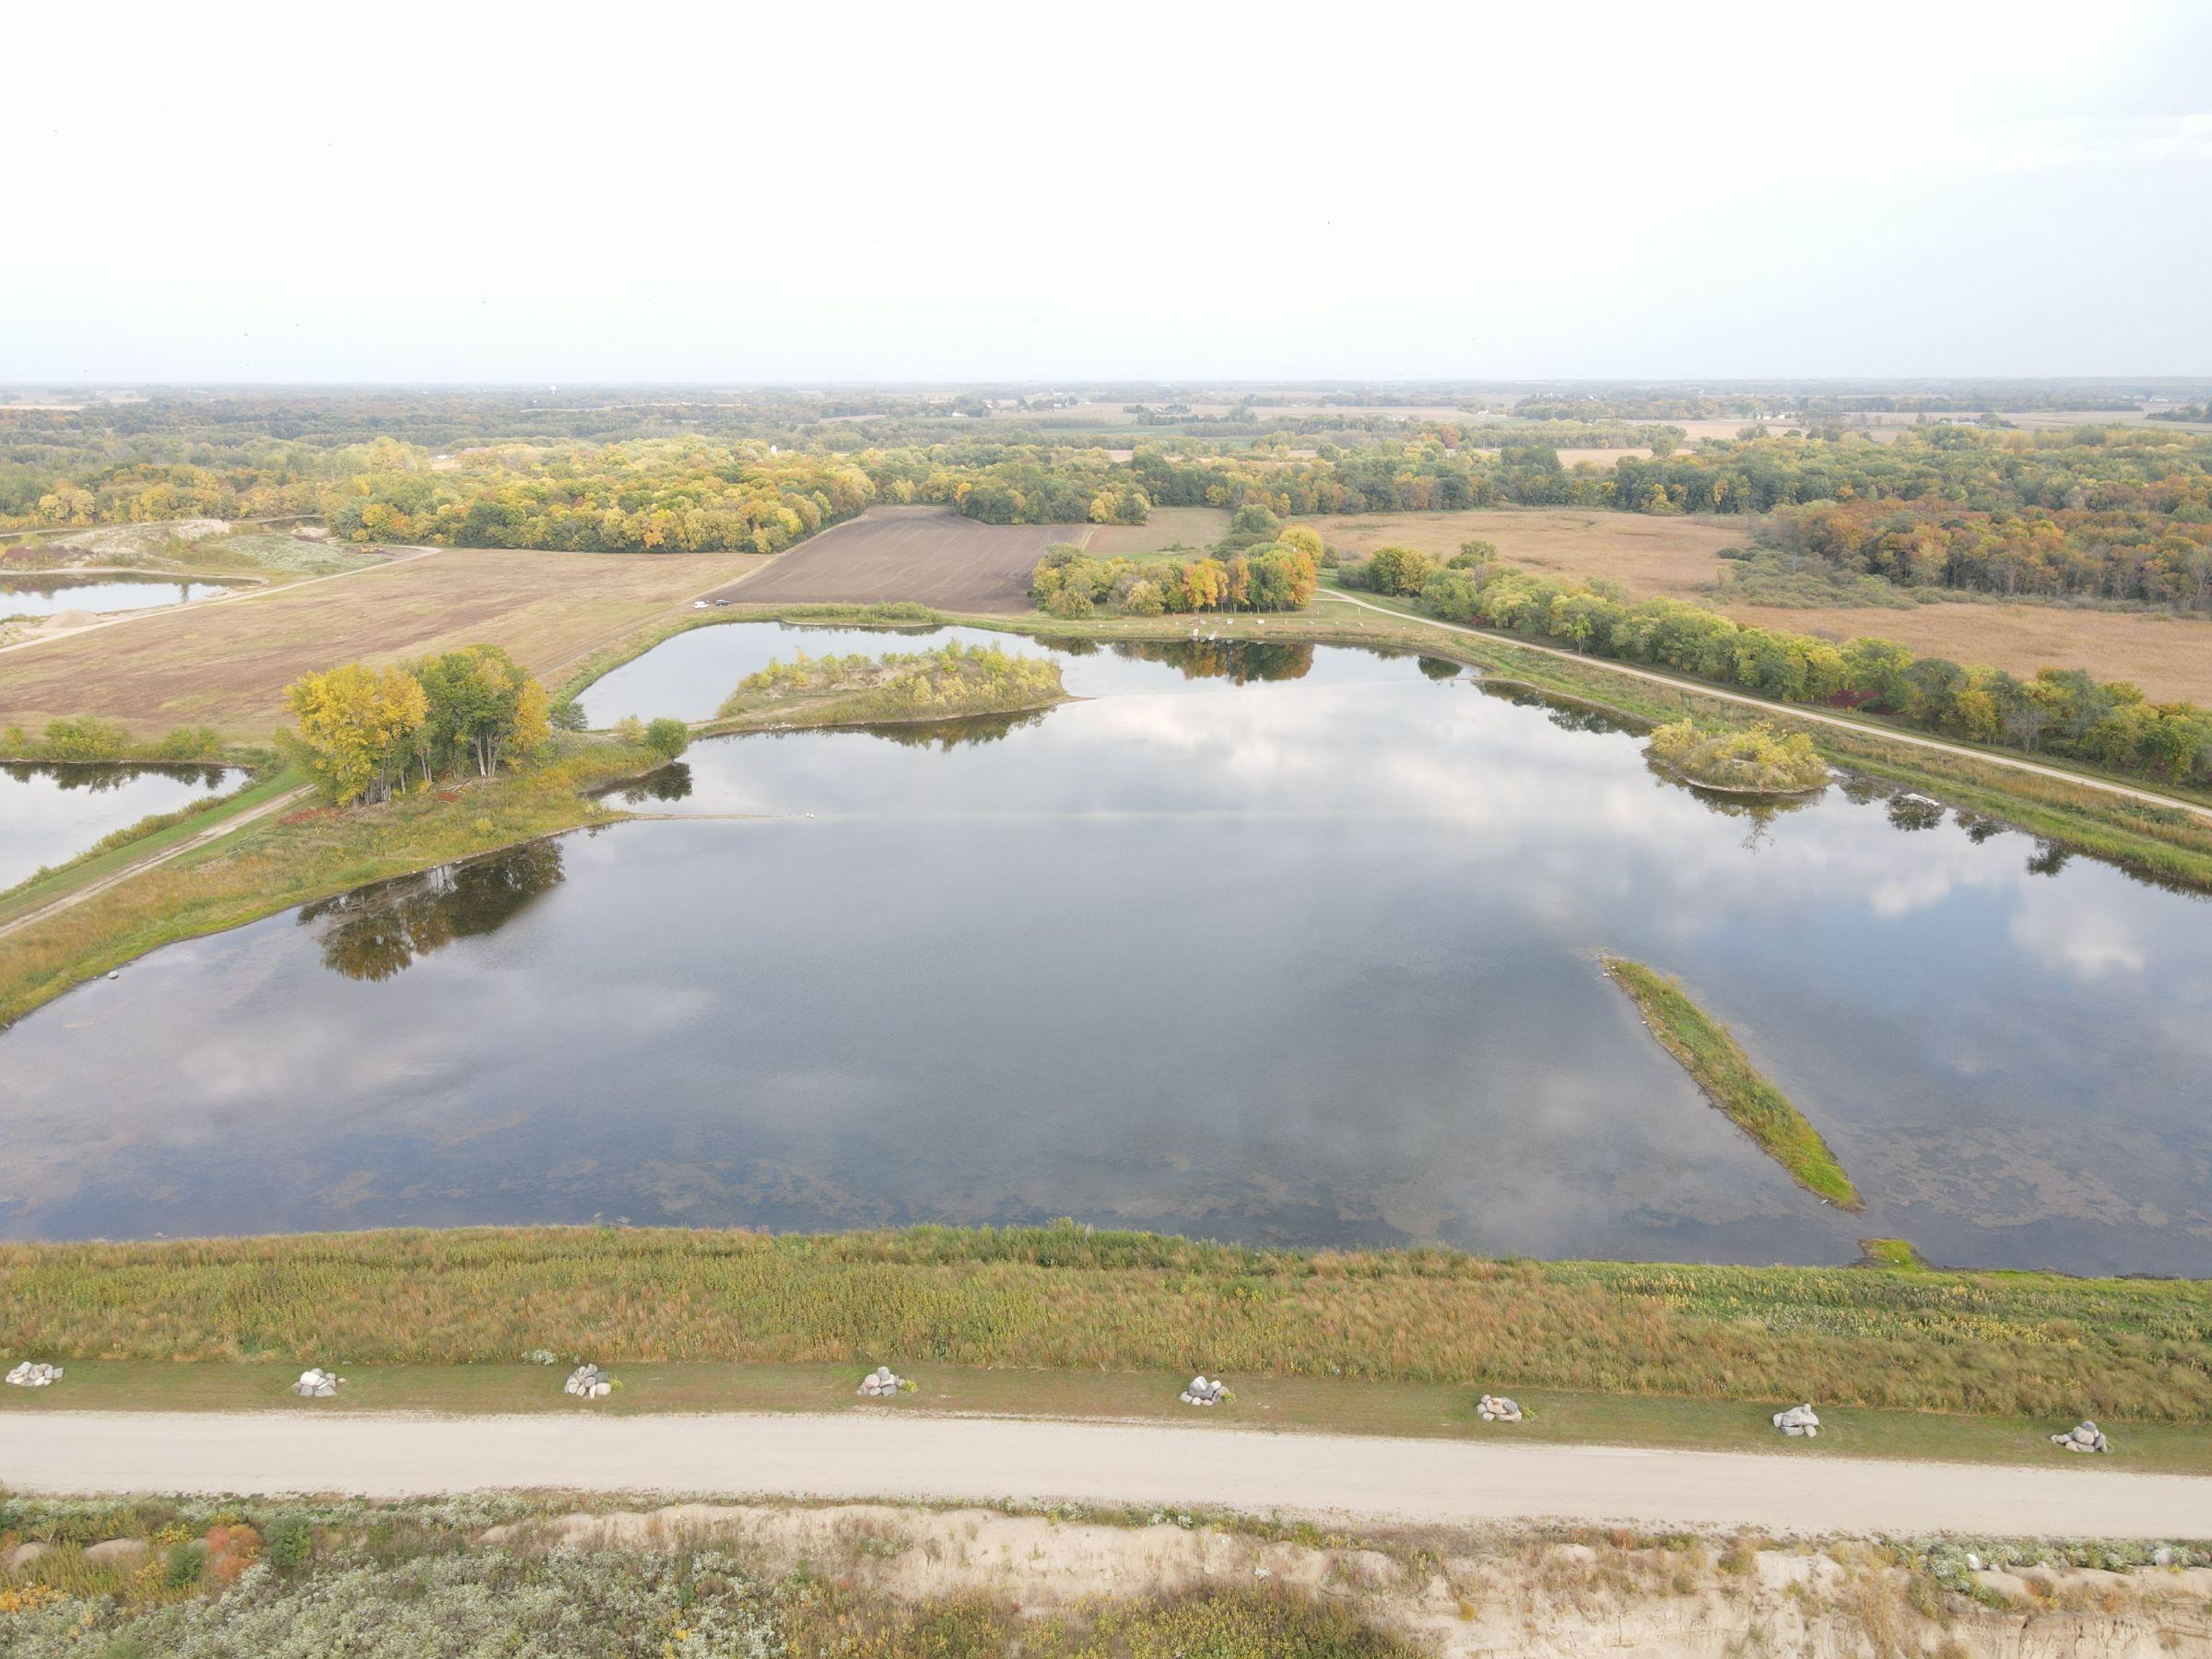 residential-land-mcleod-county-minnesota-80-acres-listing-number-15182-5-2020-10-07-142944.JPG